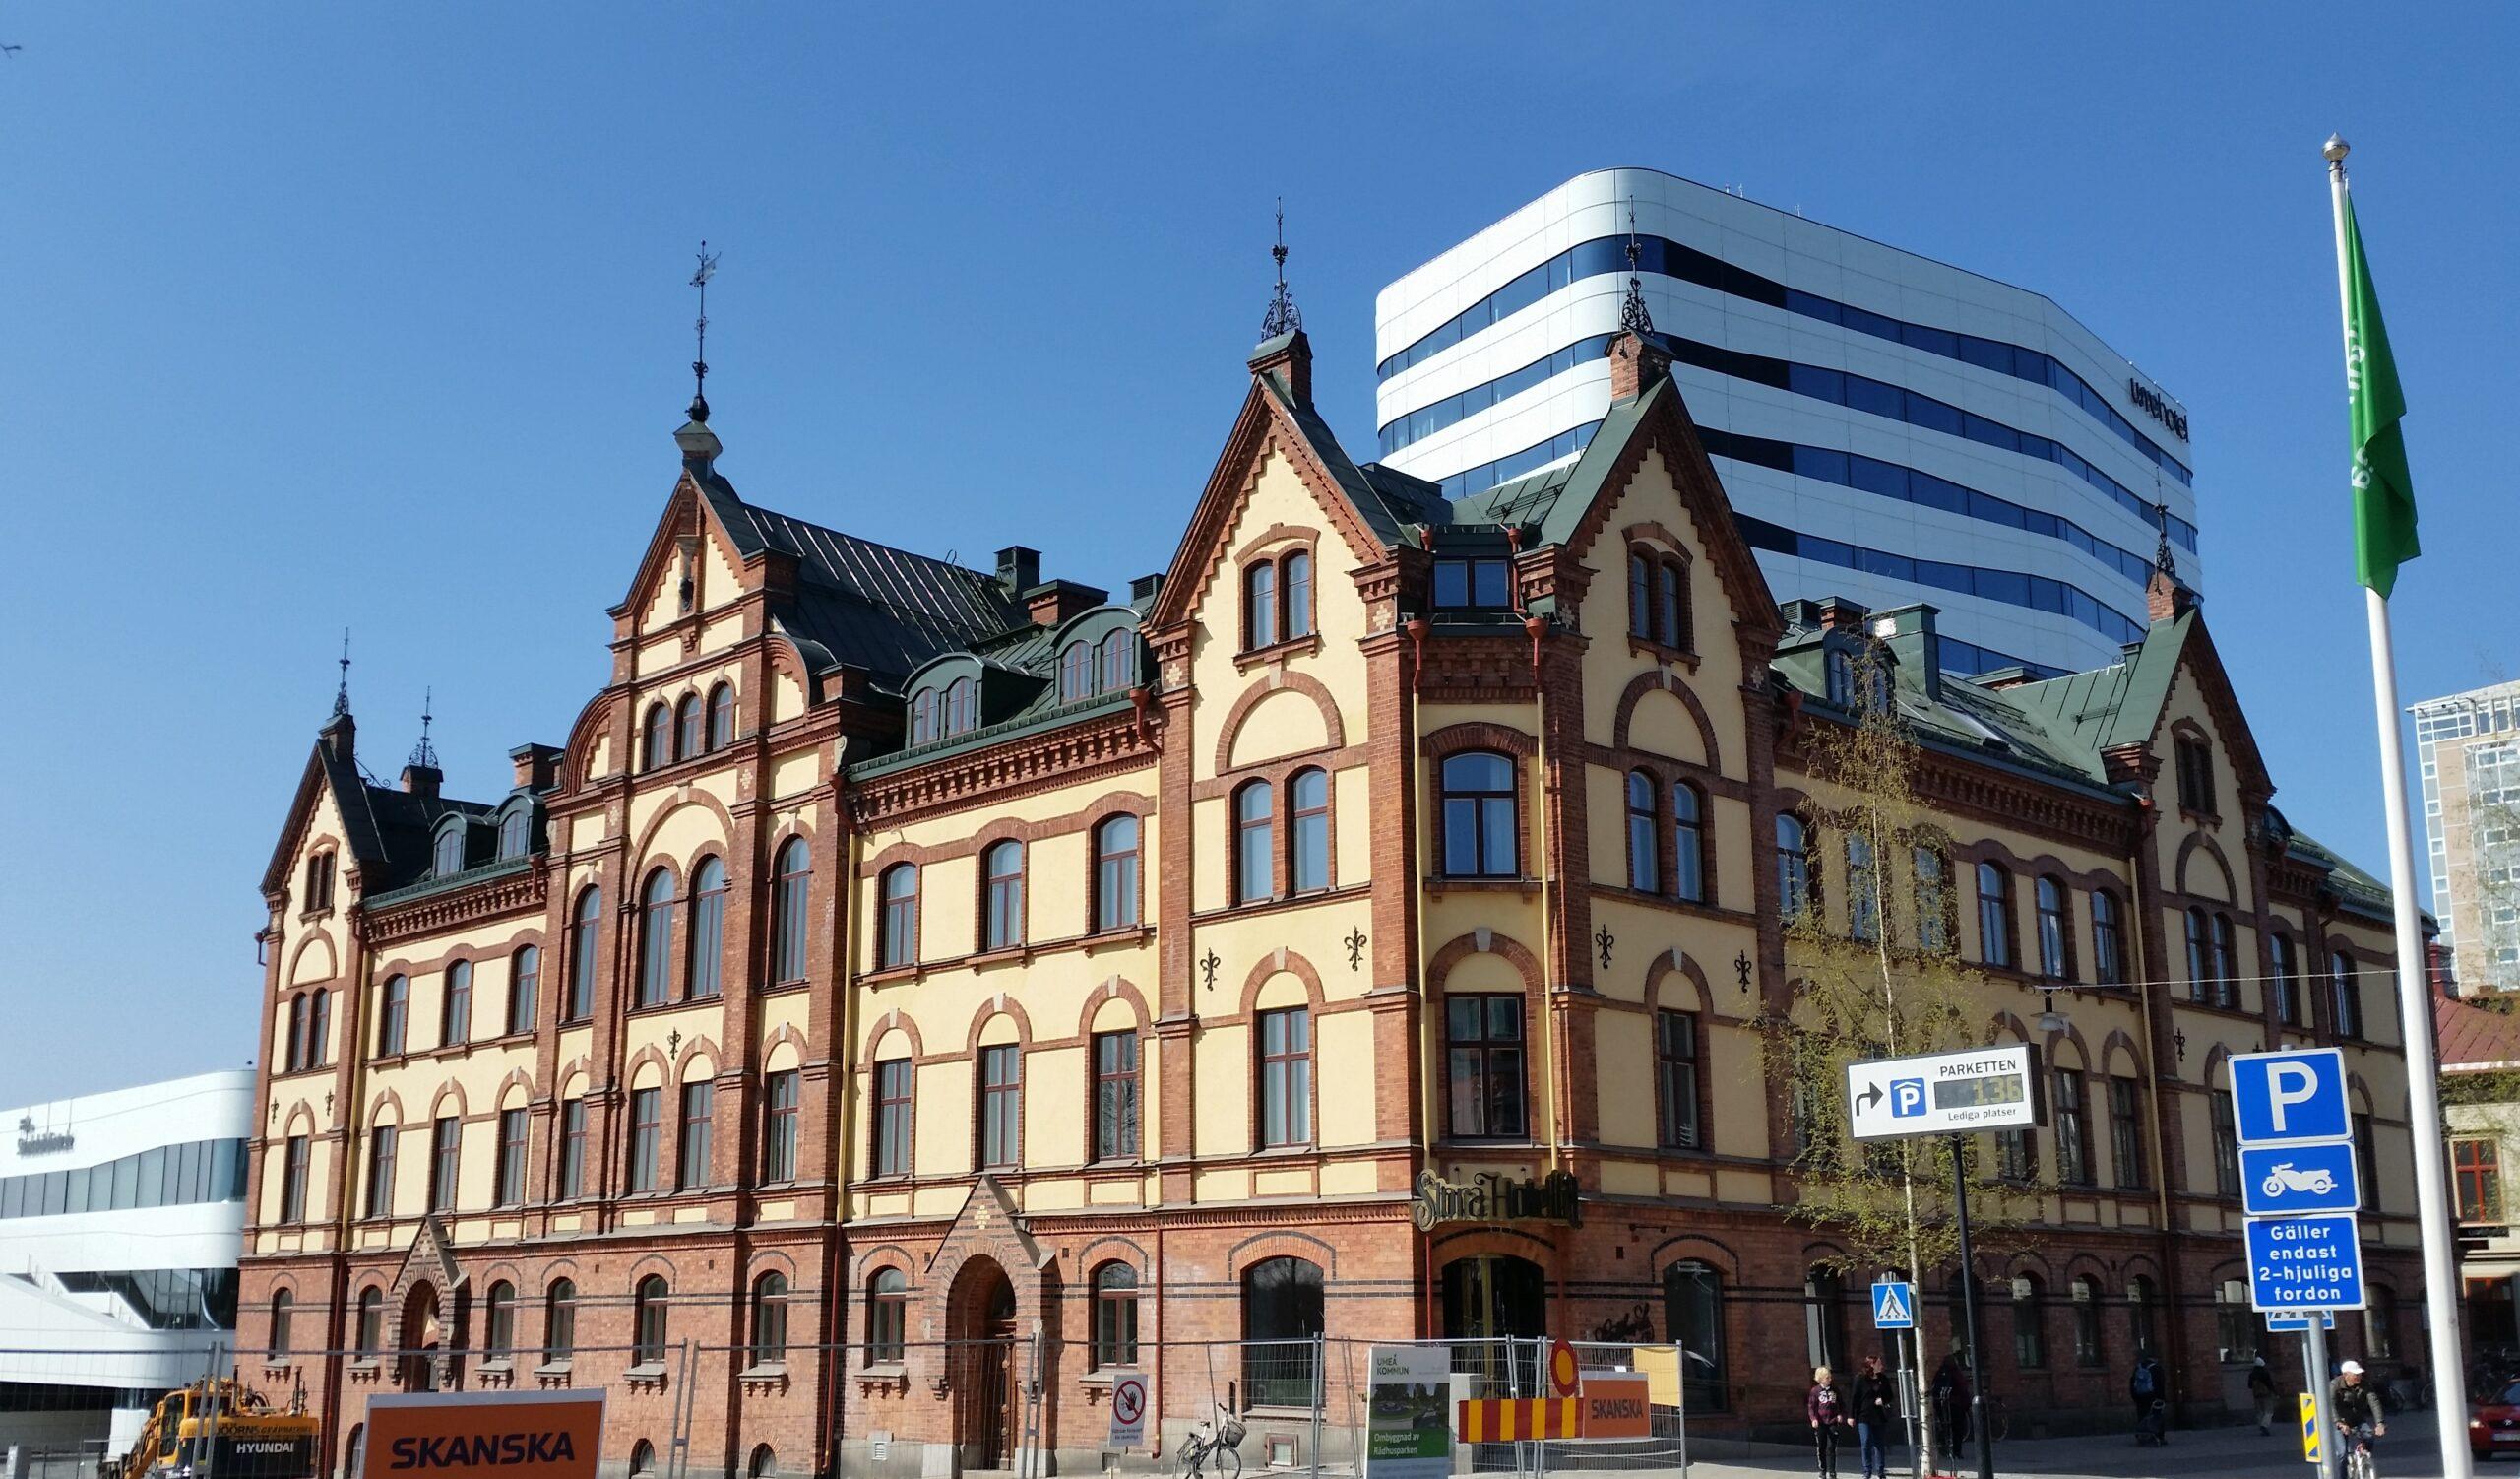 8406 - Stora hotellet, Umeå